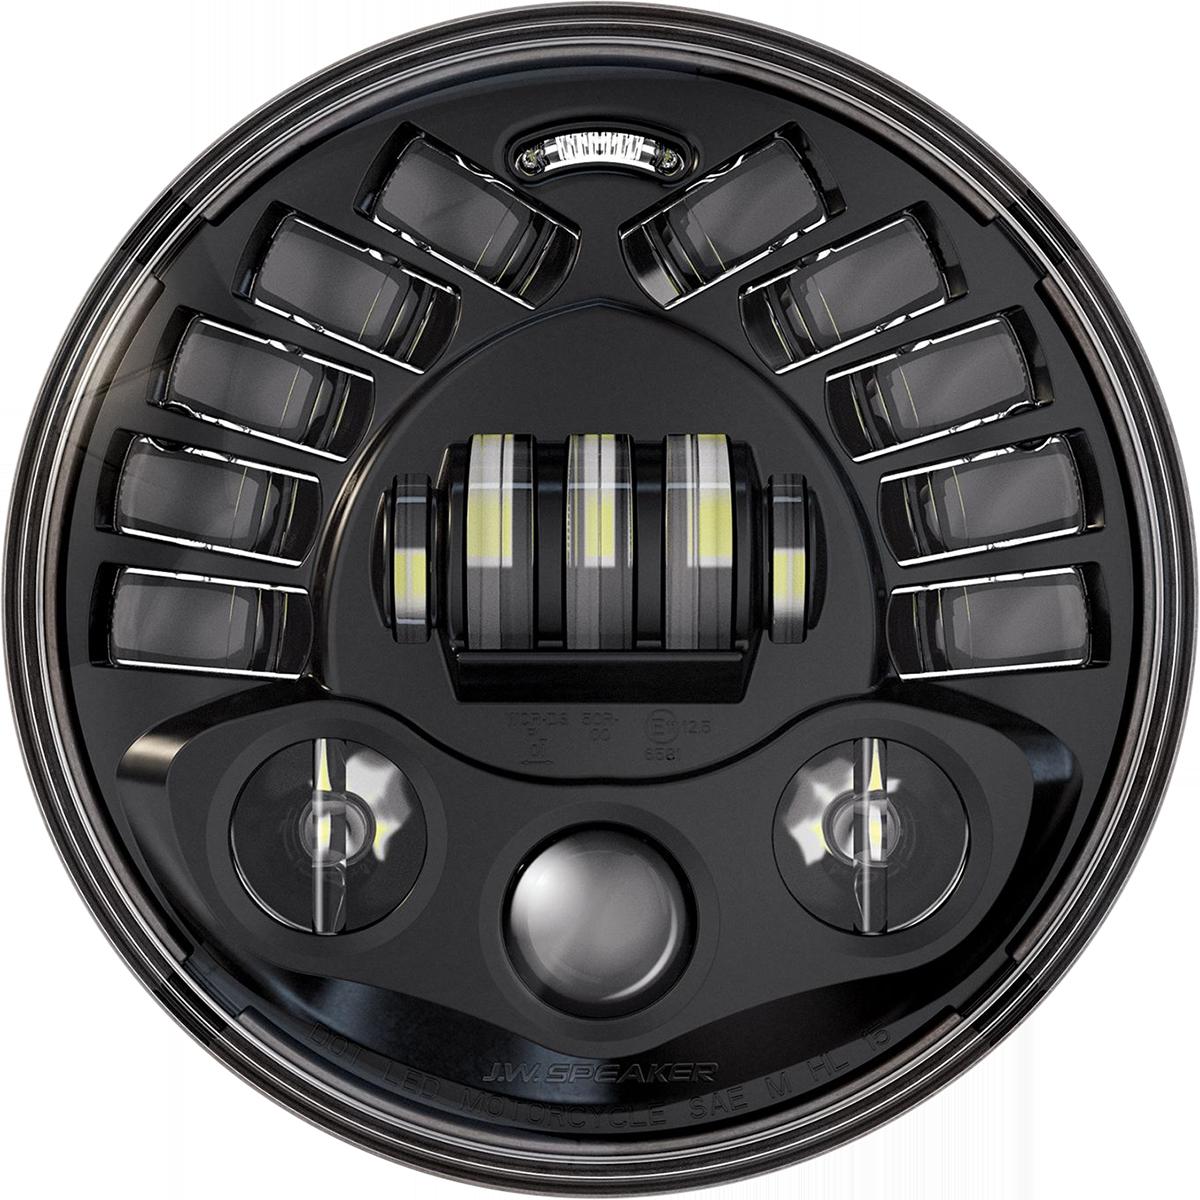 "Custom Dynamics 7"" Adaptive Black Headlight 2014-21 Indian Challenger Chieftain"